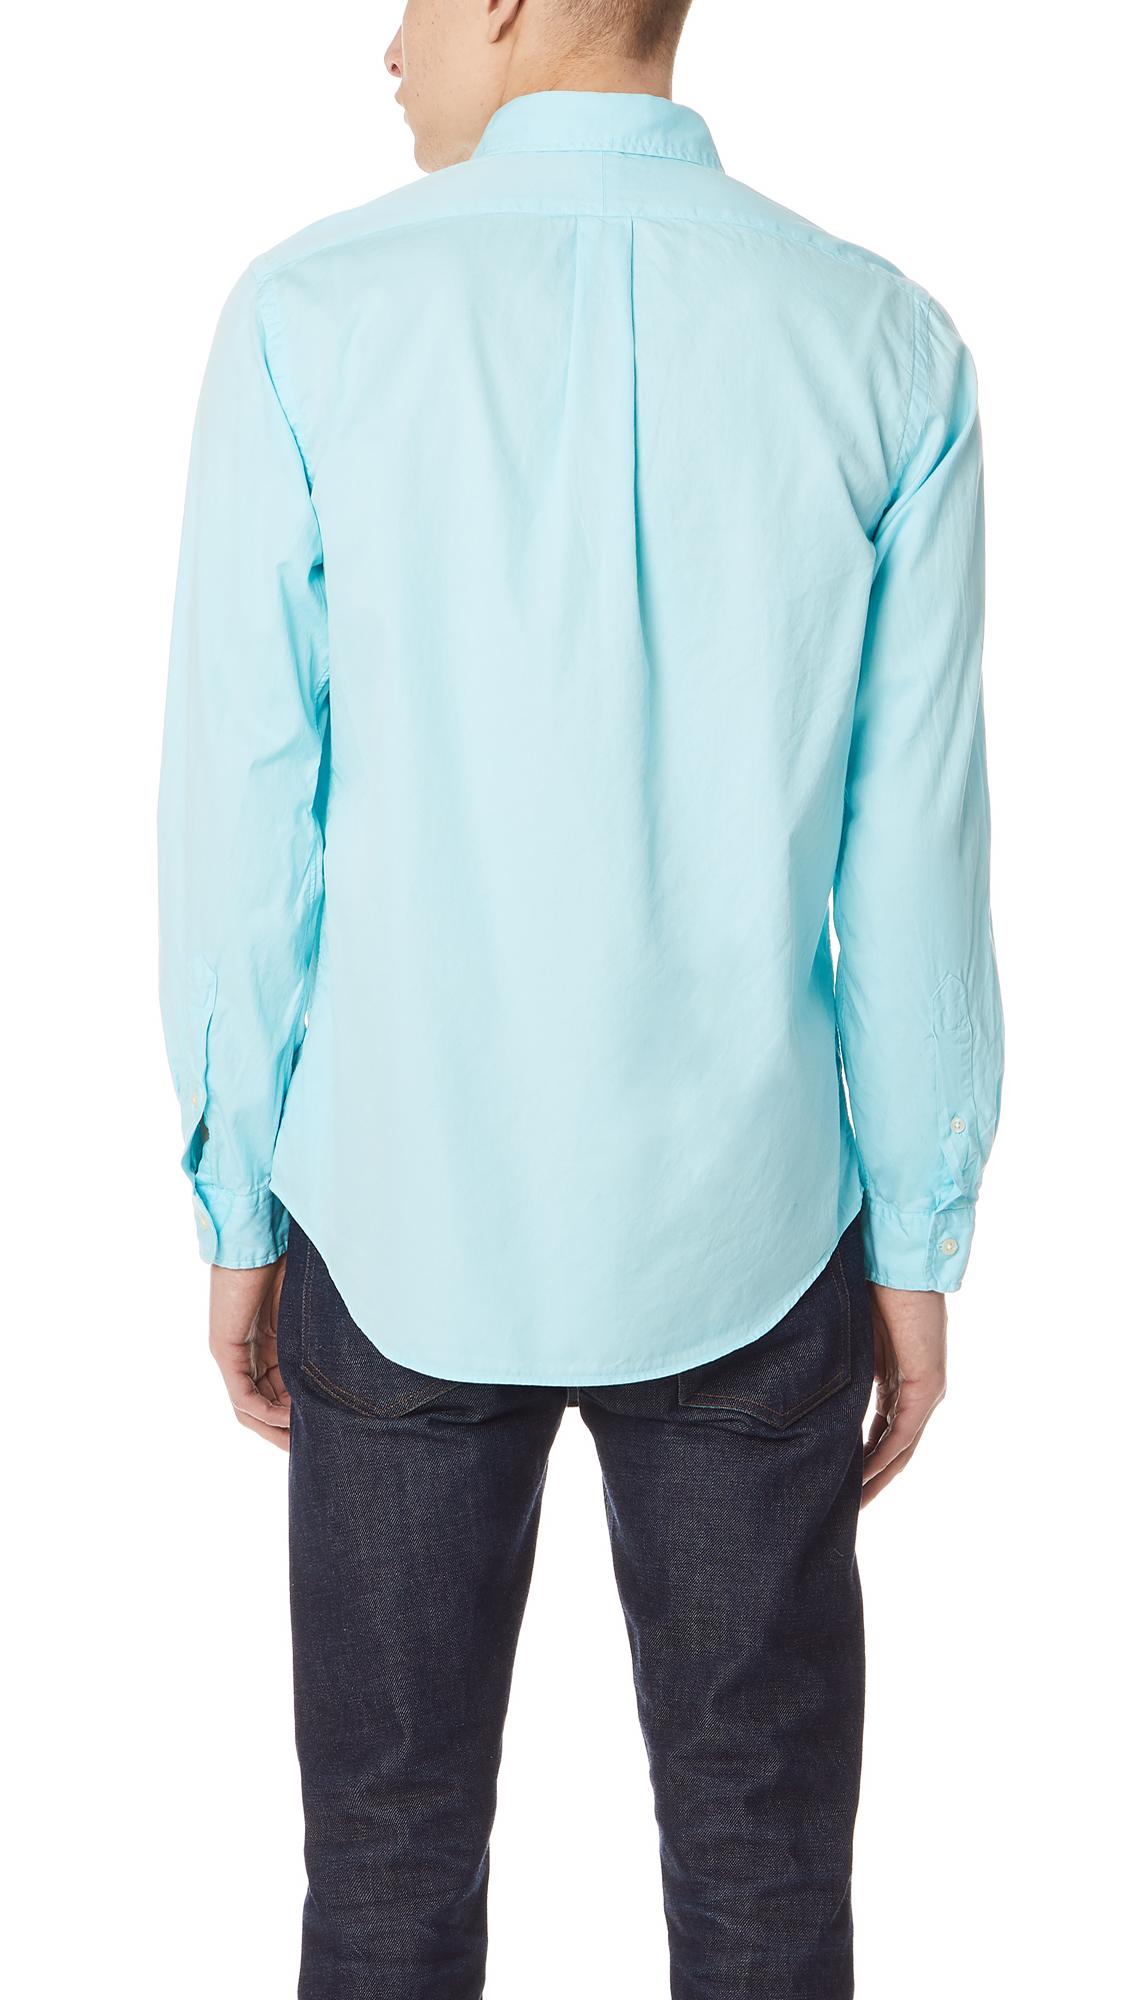 156b5a84ccf3 Polo Ralph Lauren Chino Shirt